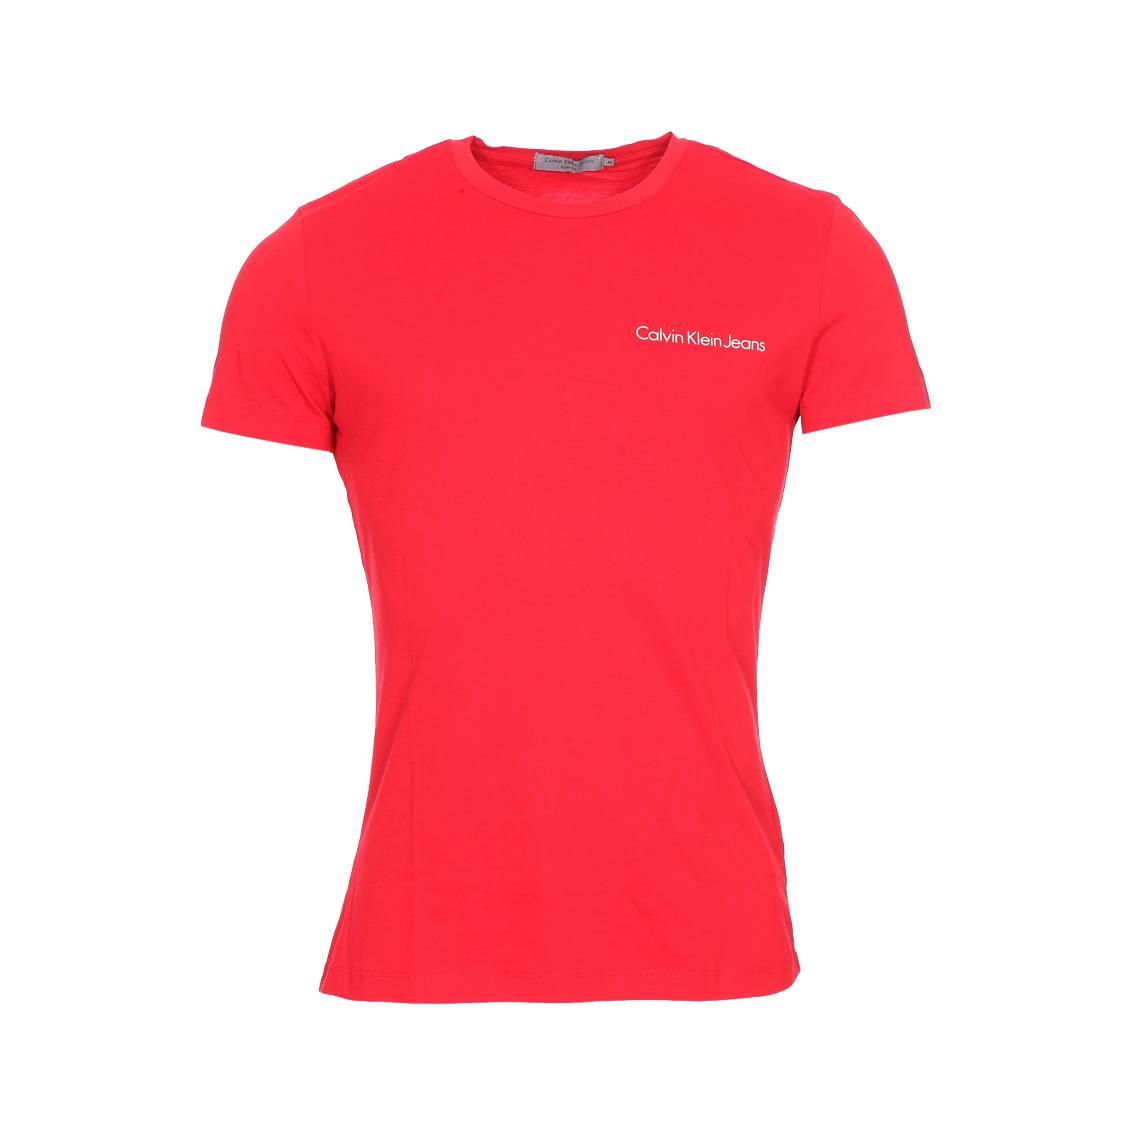 Tee-shirt col rond  typoko en coton rouge floqué